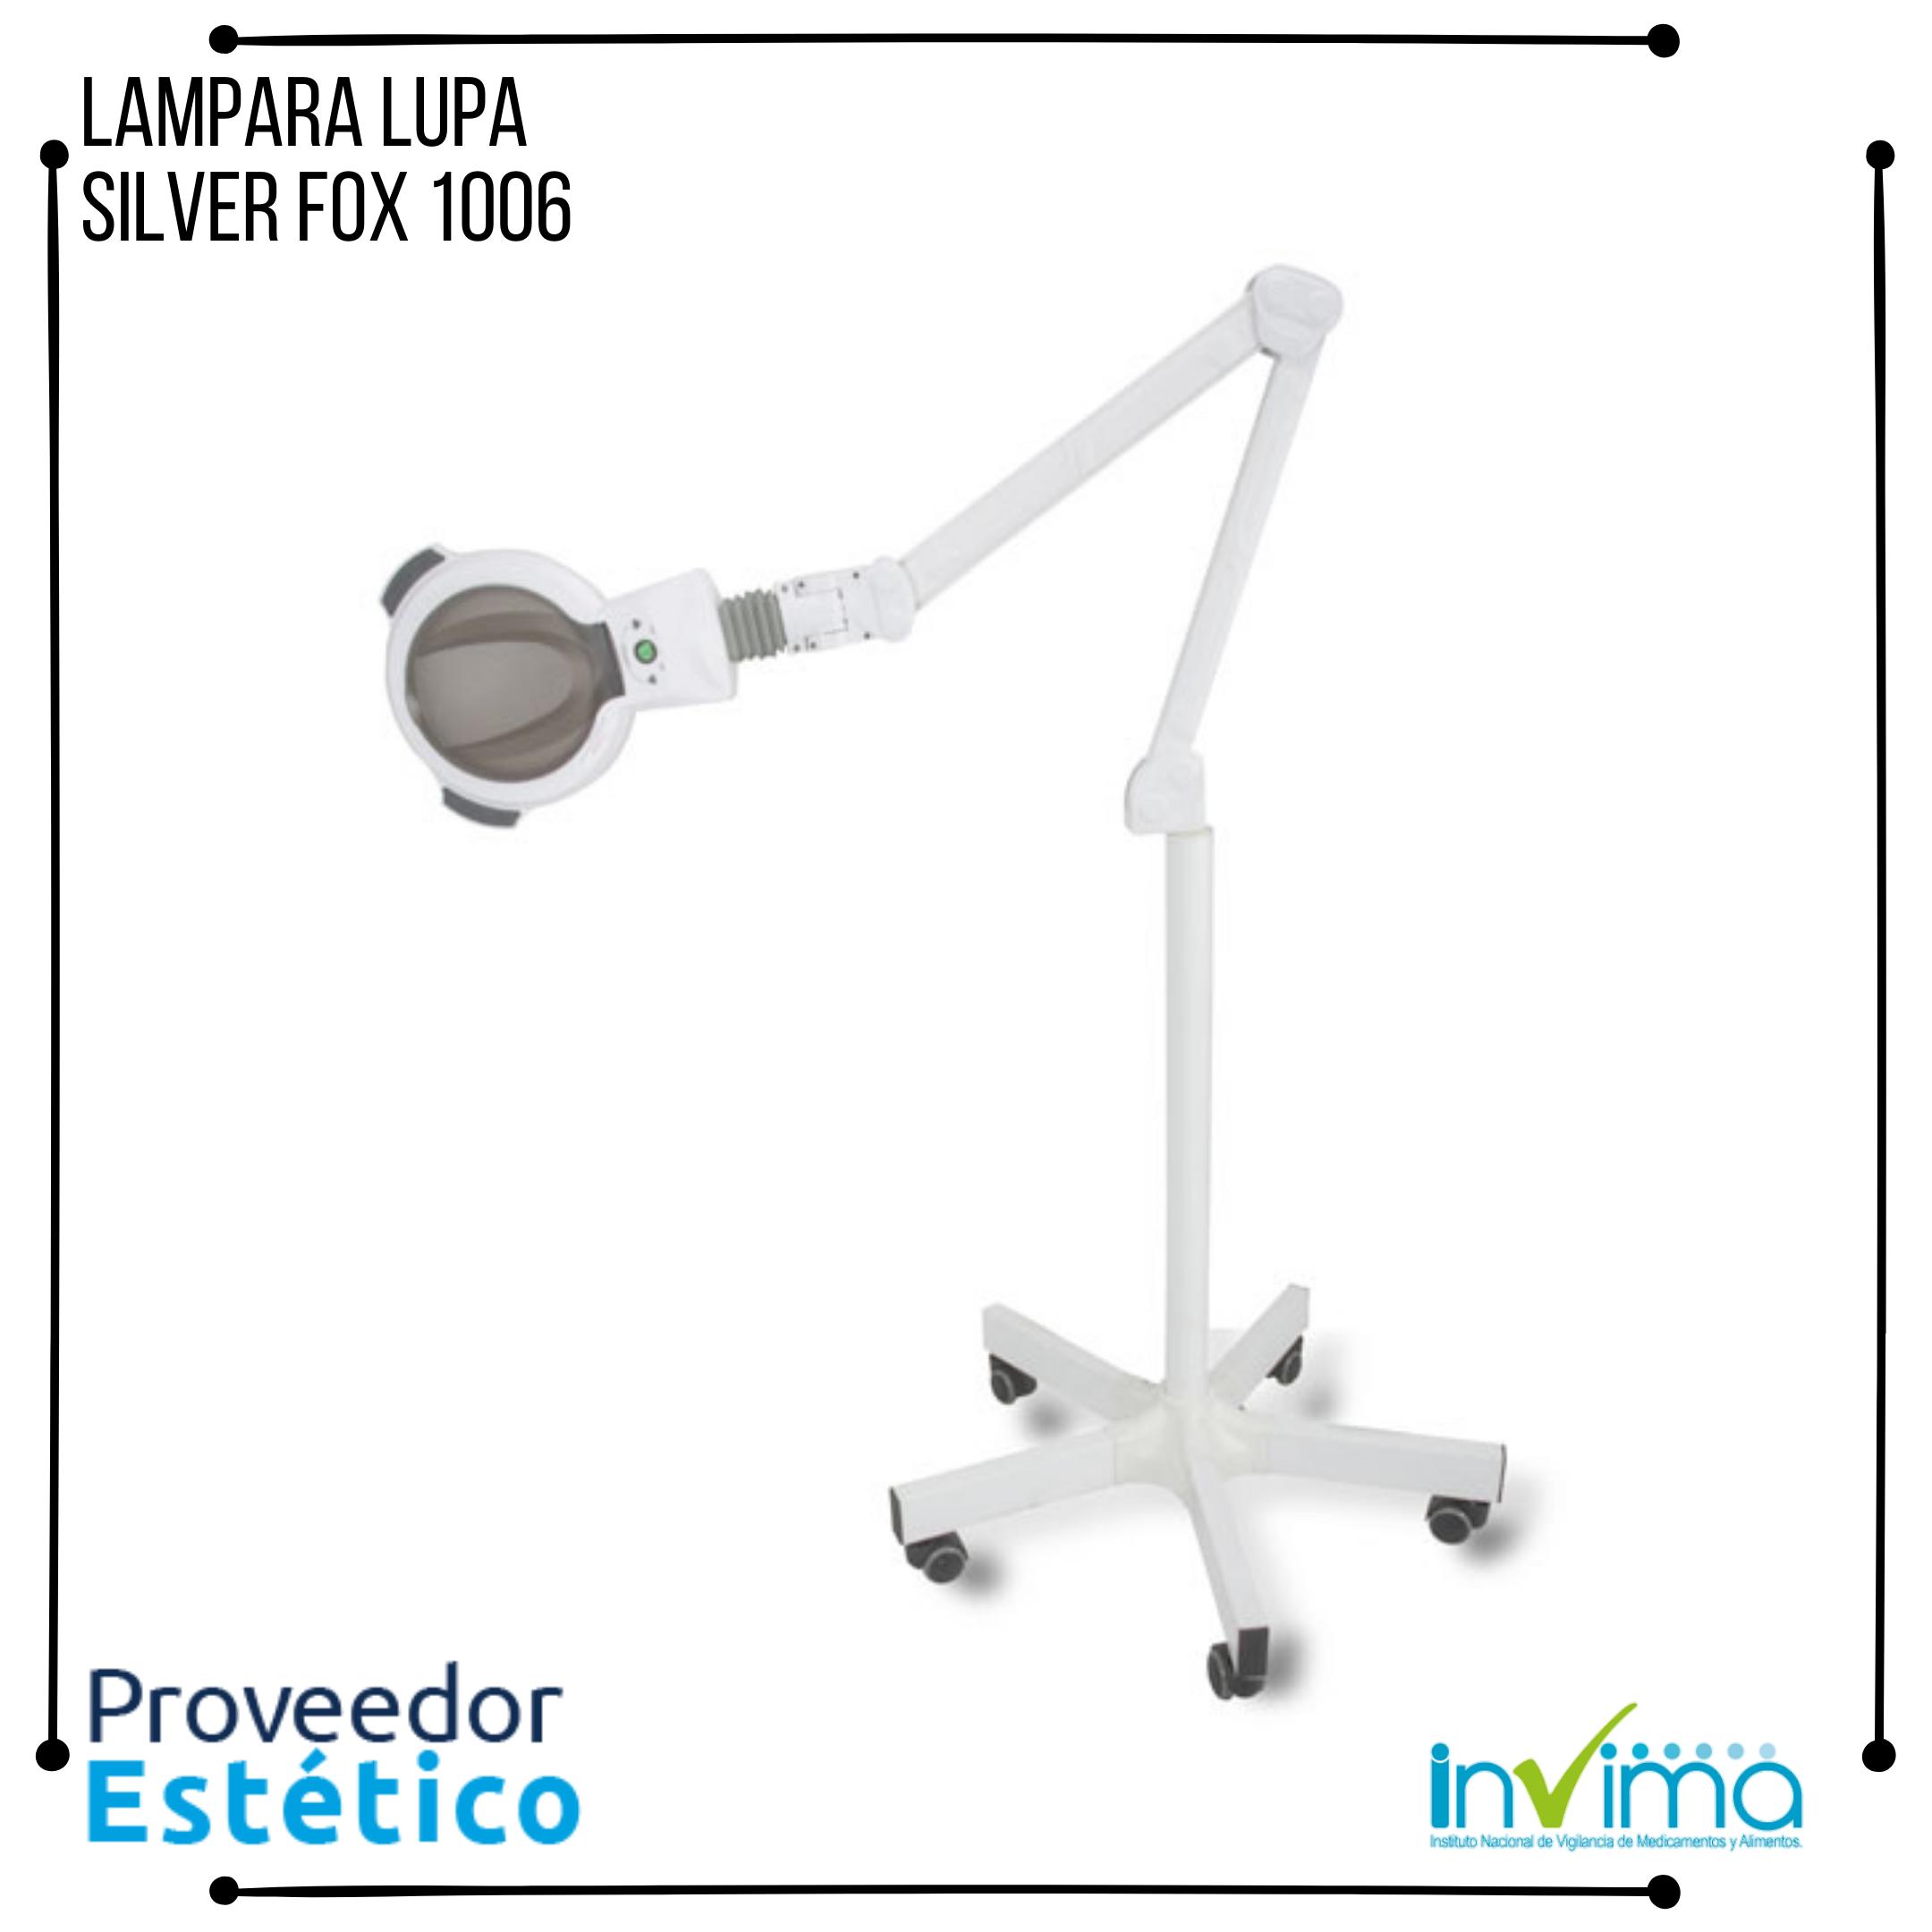 https://0201.nccdn.net/1_2/000/000/143/f81/lampara-lupa-silver-fox-1006--2-.png